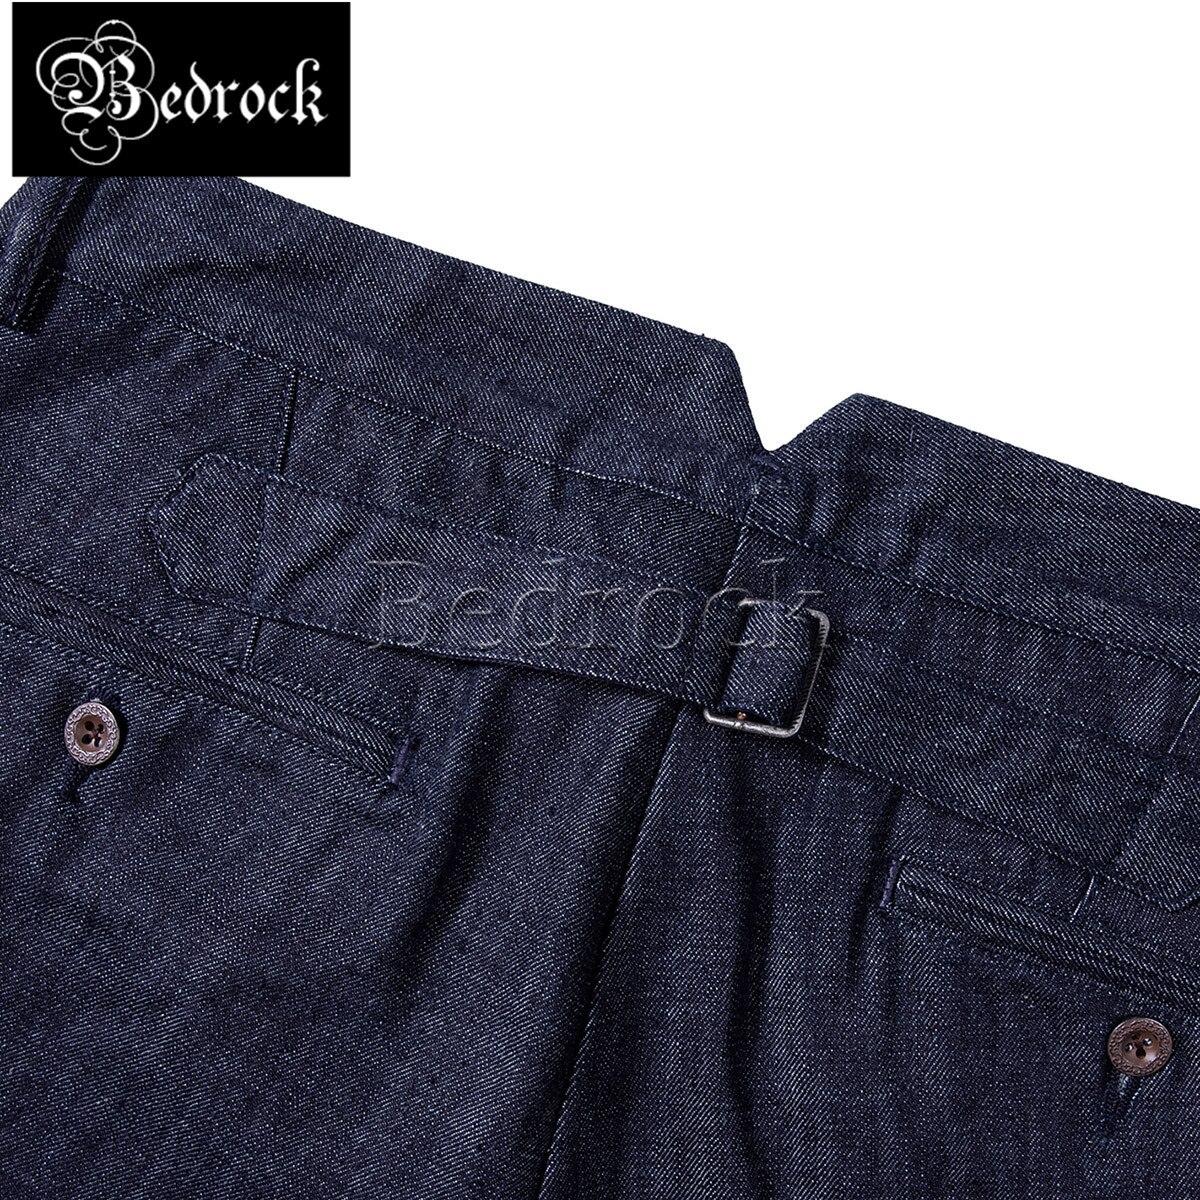 12oz High waist loose wide-leg denim jeans Paris buckle double pleated French gentleman overalls Retro snowflake jeans